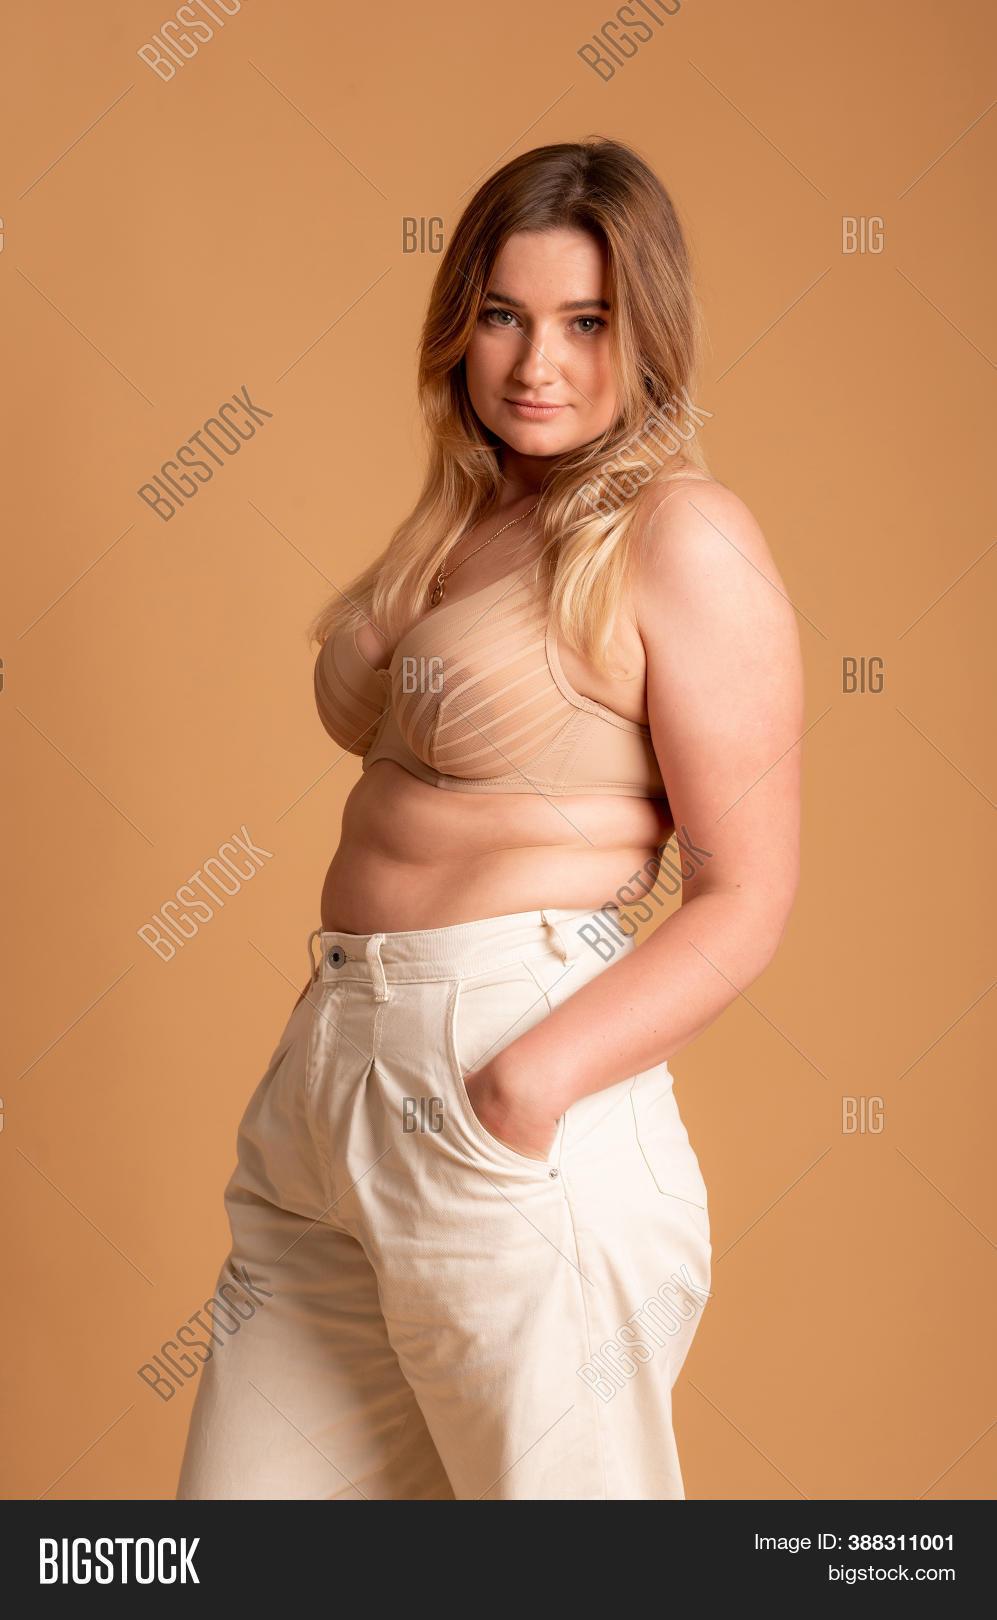 Women overweight beautiful is